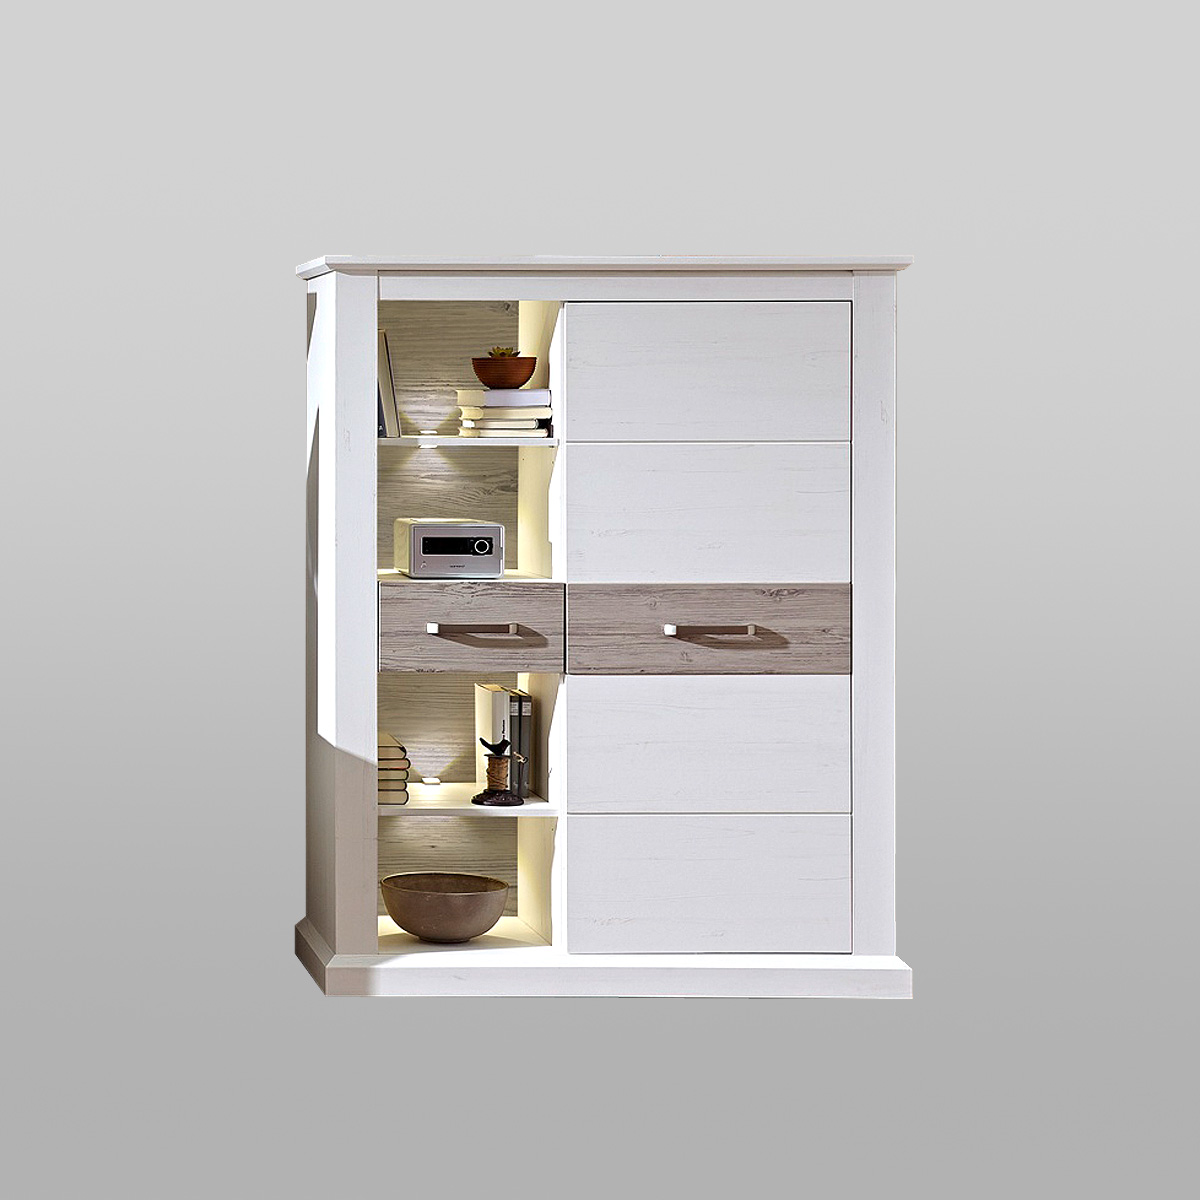 wohnzimmer beleuchtung modern. Black Bedroom Furniture Sets. Home Design Ideas